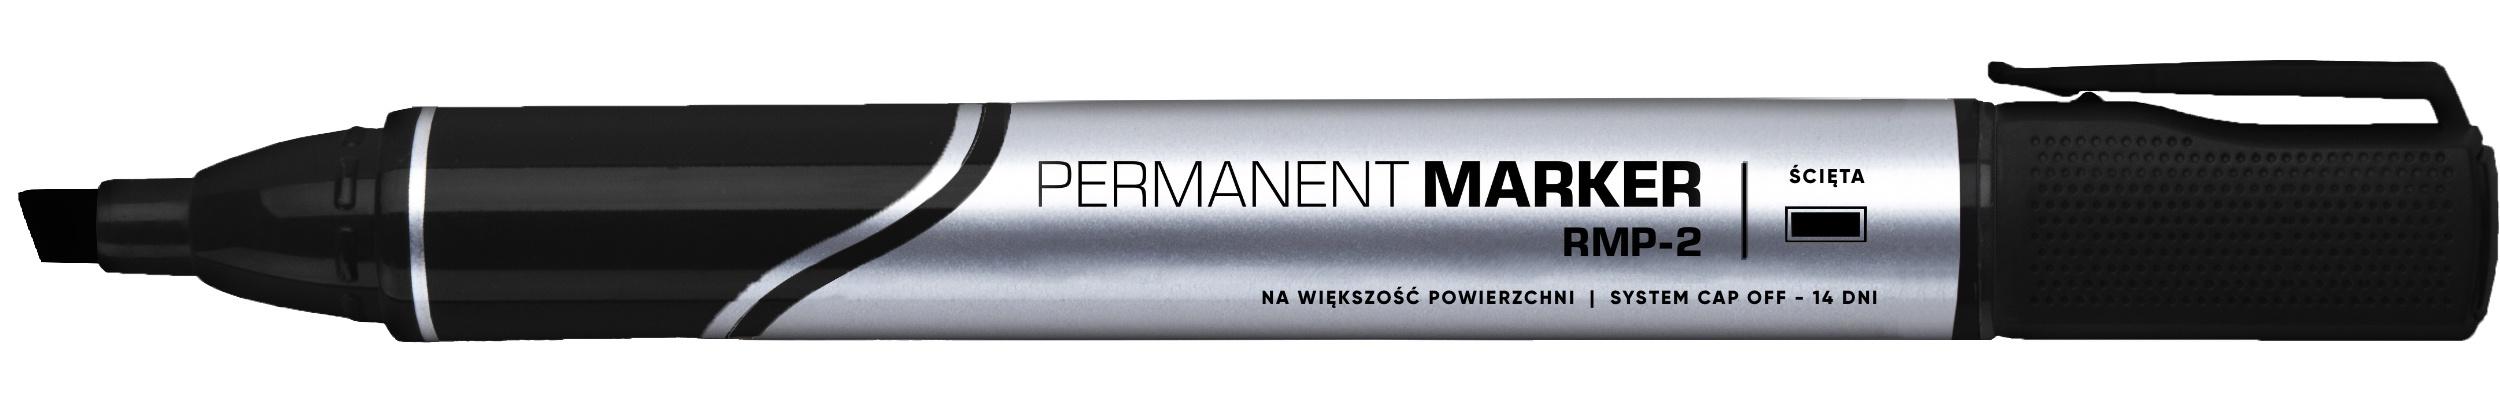 Marker permanentny RMP-2